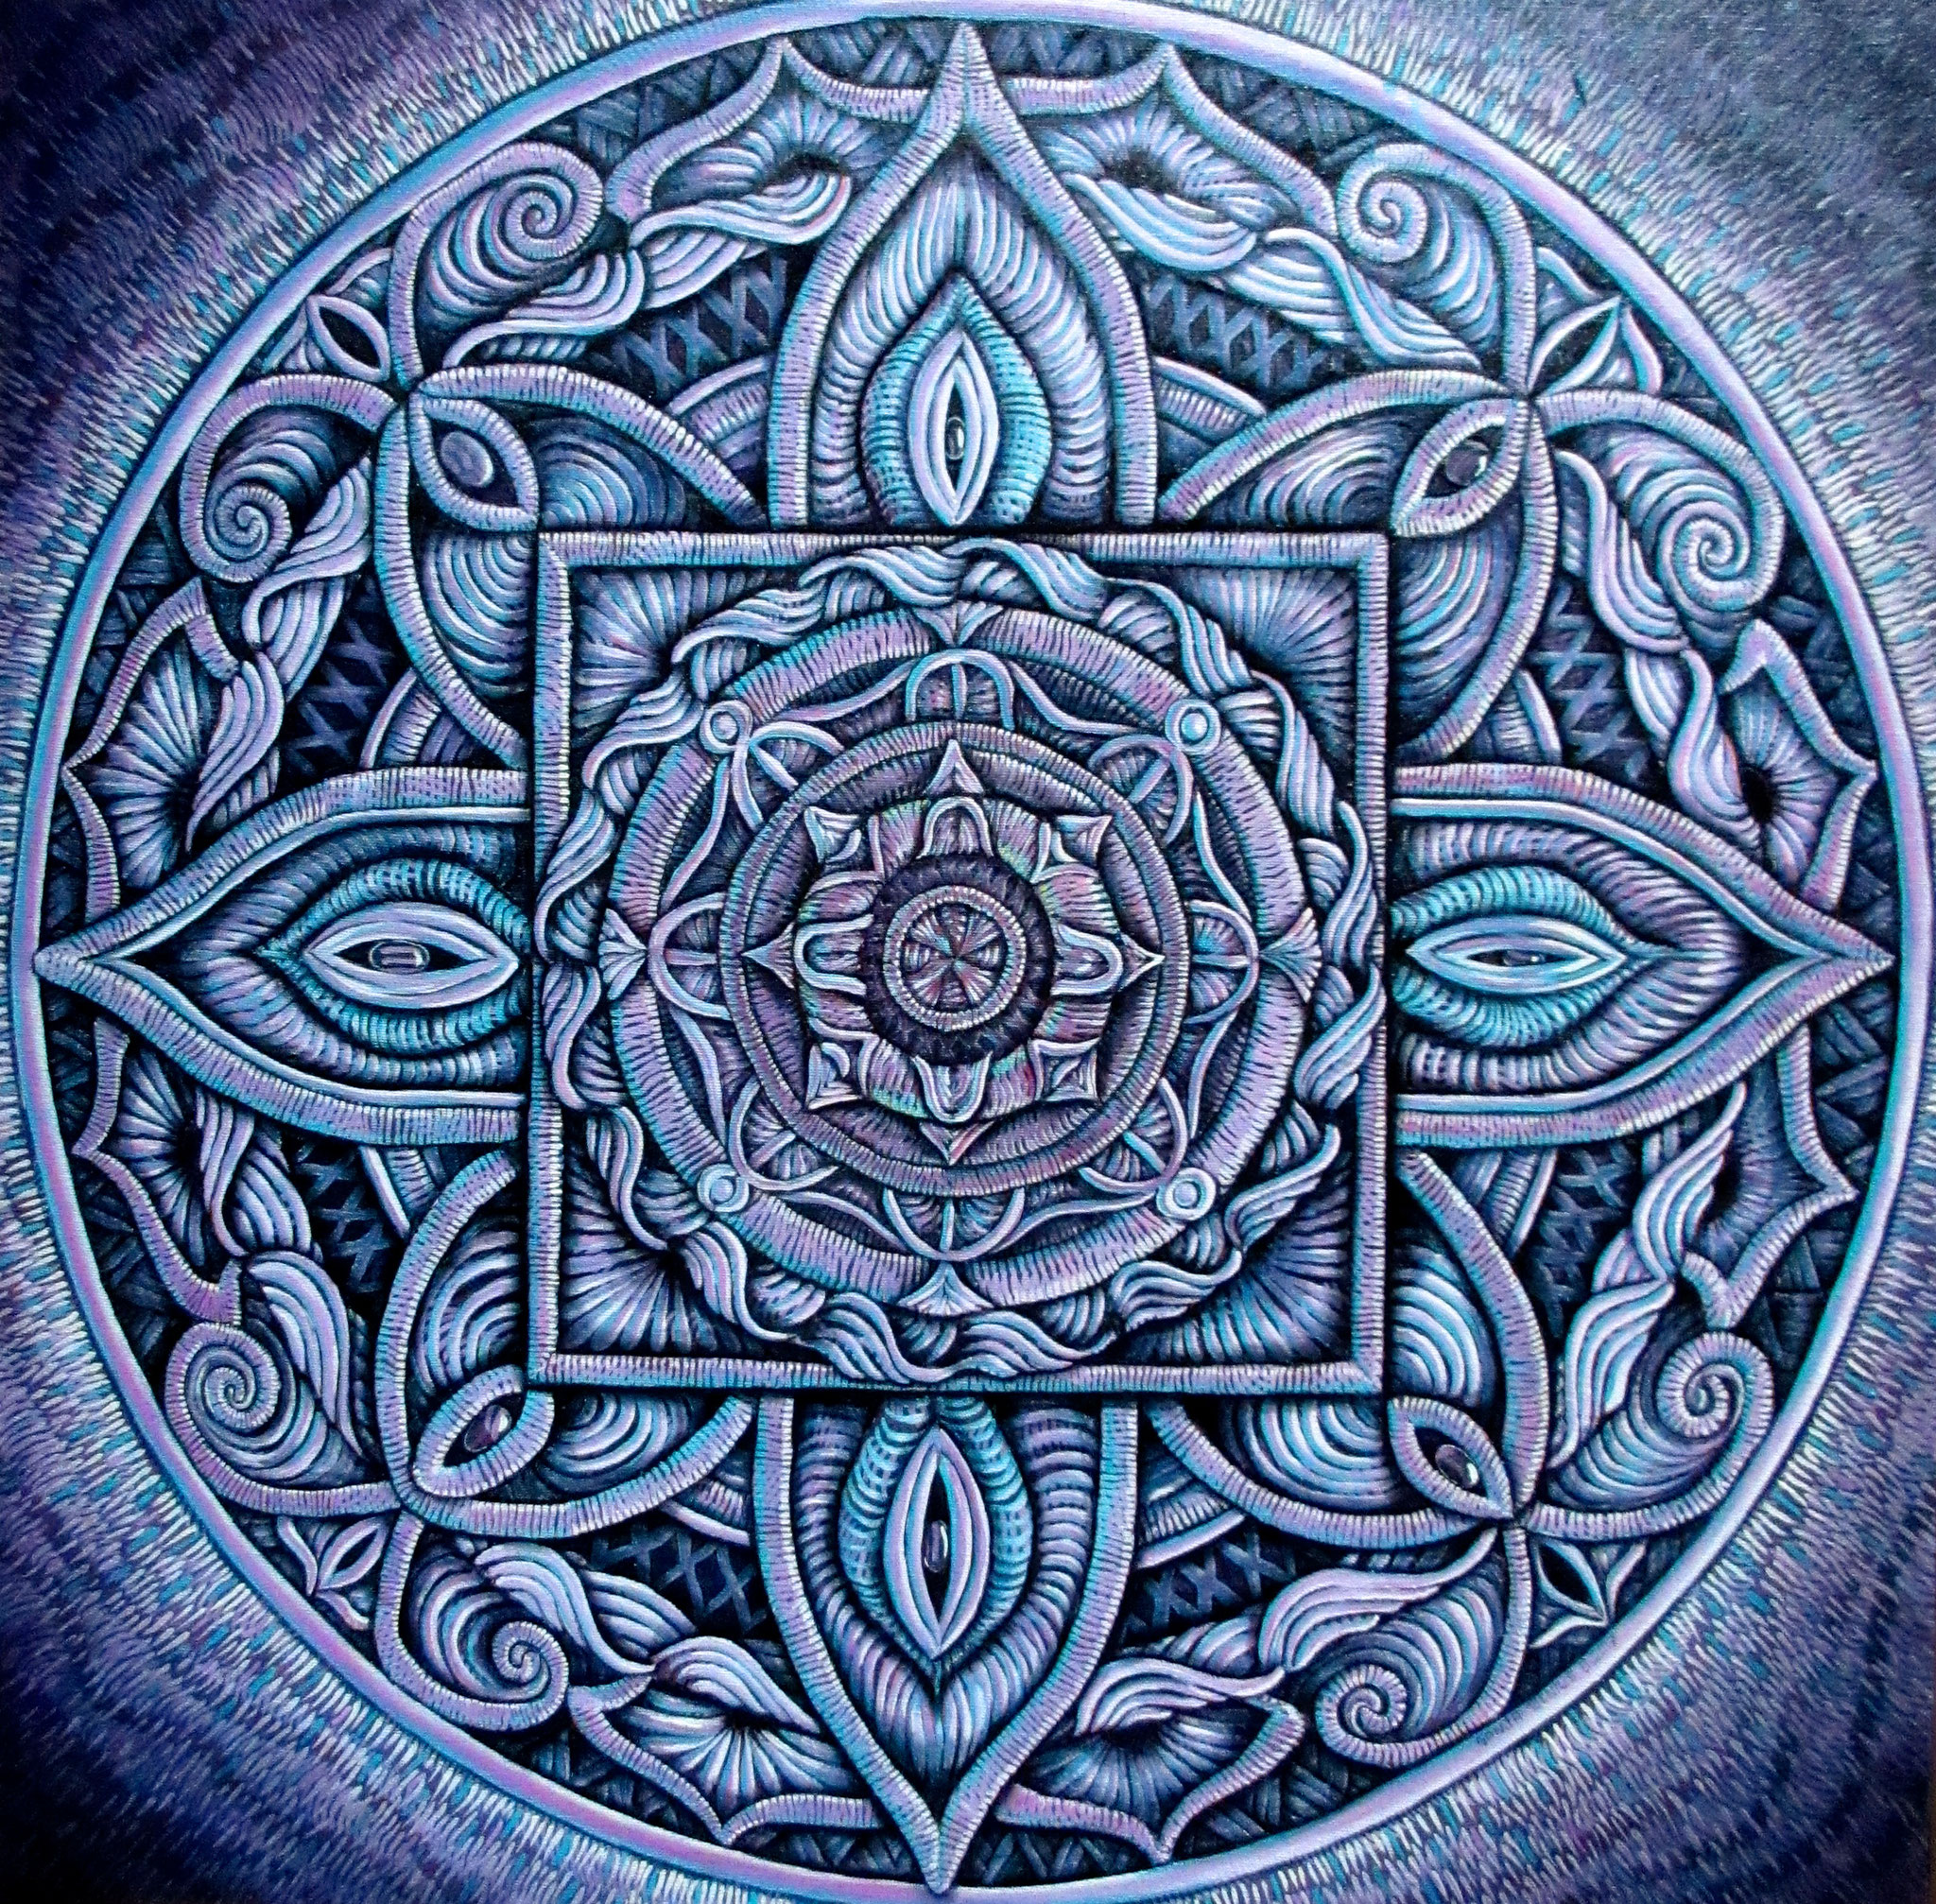 Mandala, oil on canvas 24x24, 8/2017 (8-9)